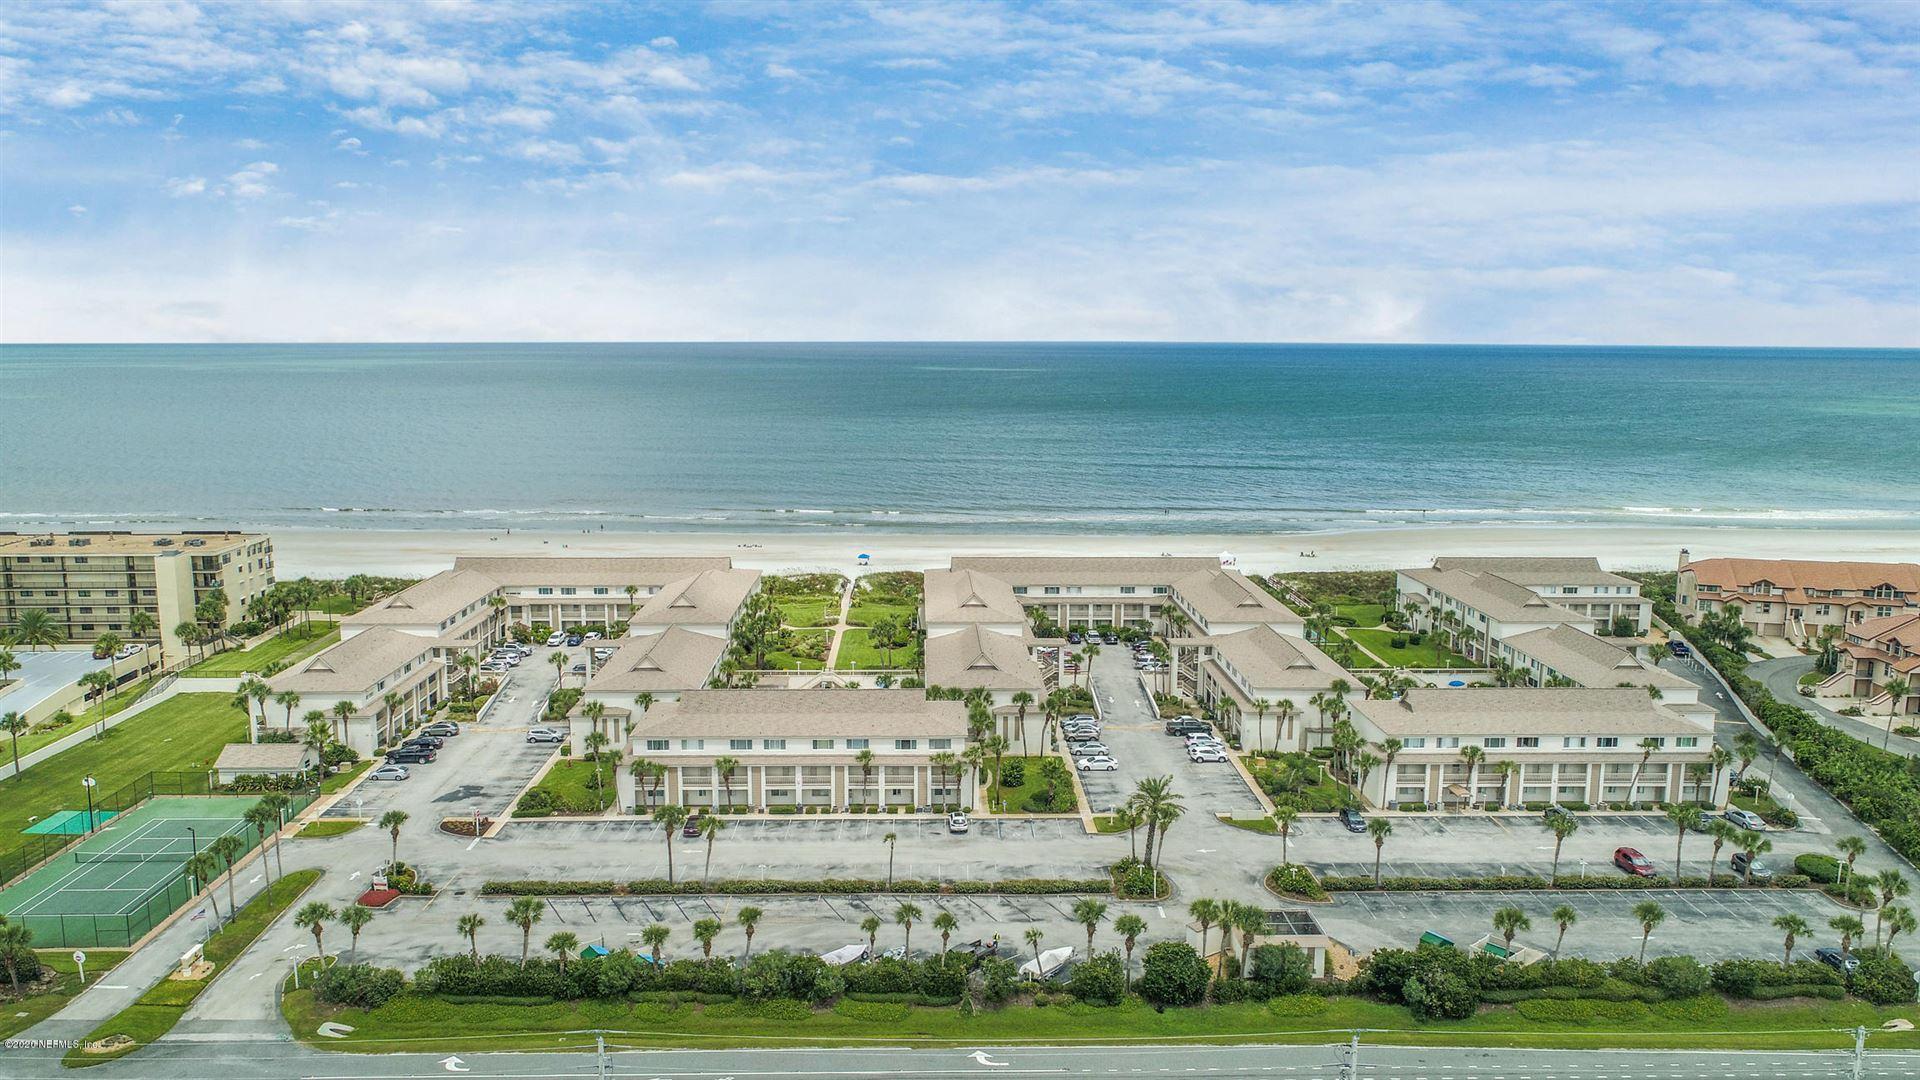 8130 A1A S, Crescent Beach, FL 32080 - MLS#: 1068409